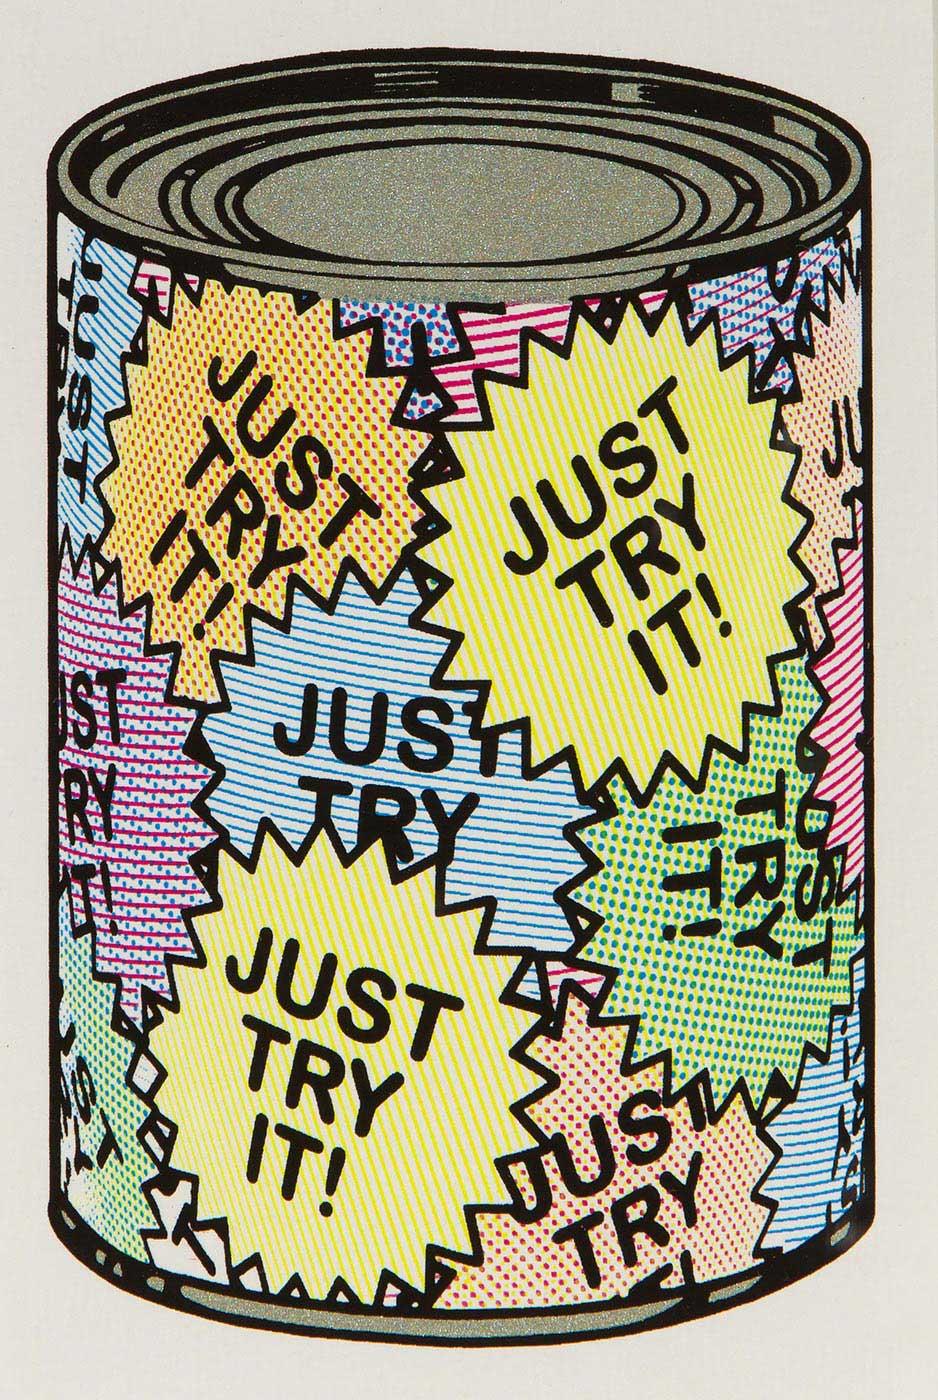 Jonathan Stewart - JUST TRY IT!